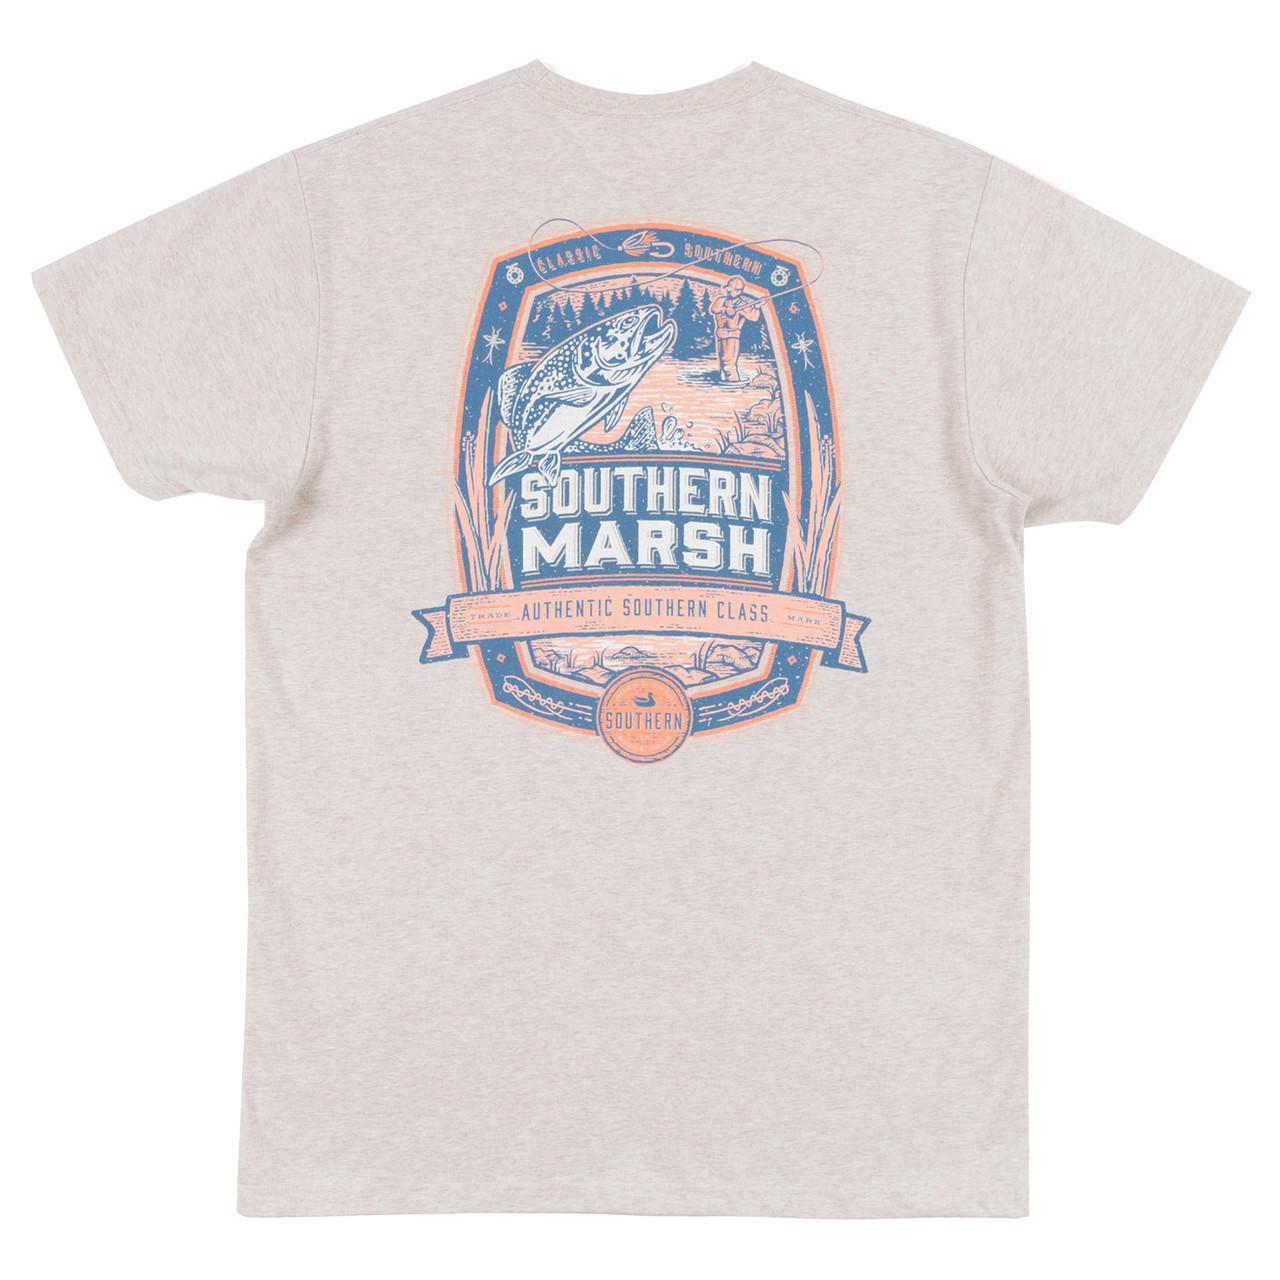 5f56882b0d72 Southern Marsh Genuine Fly Fishing Short Sleeve T-shirt - Trenz Shirt  Company